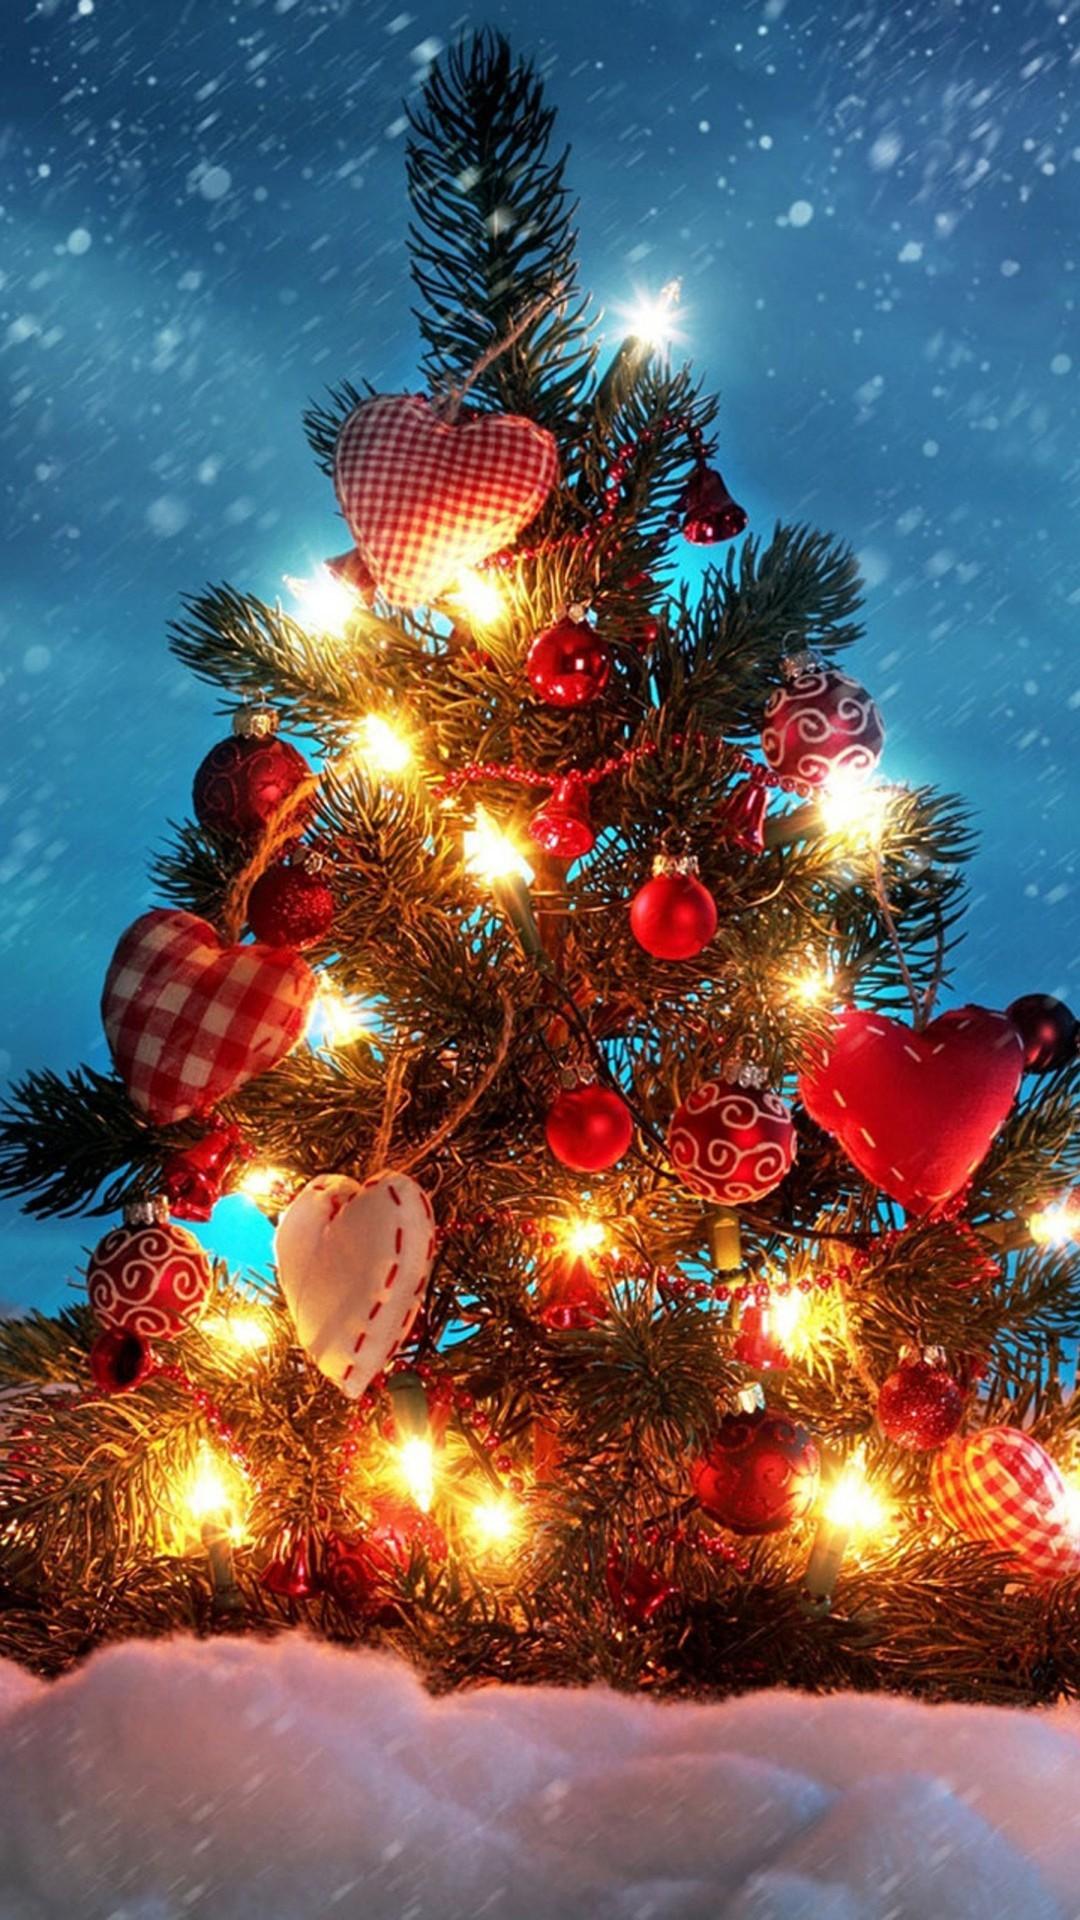 christmas tree lights android wallpaper android hd wallpapers - Christmas Wallpaper For Android